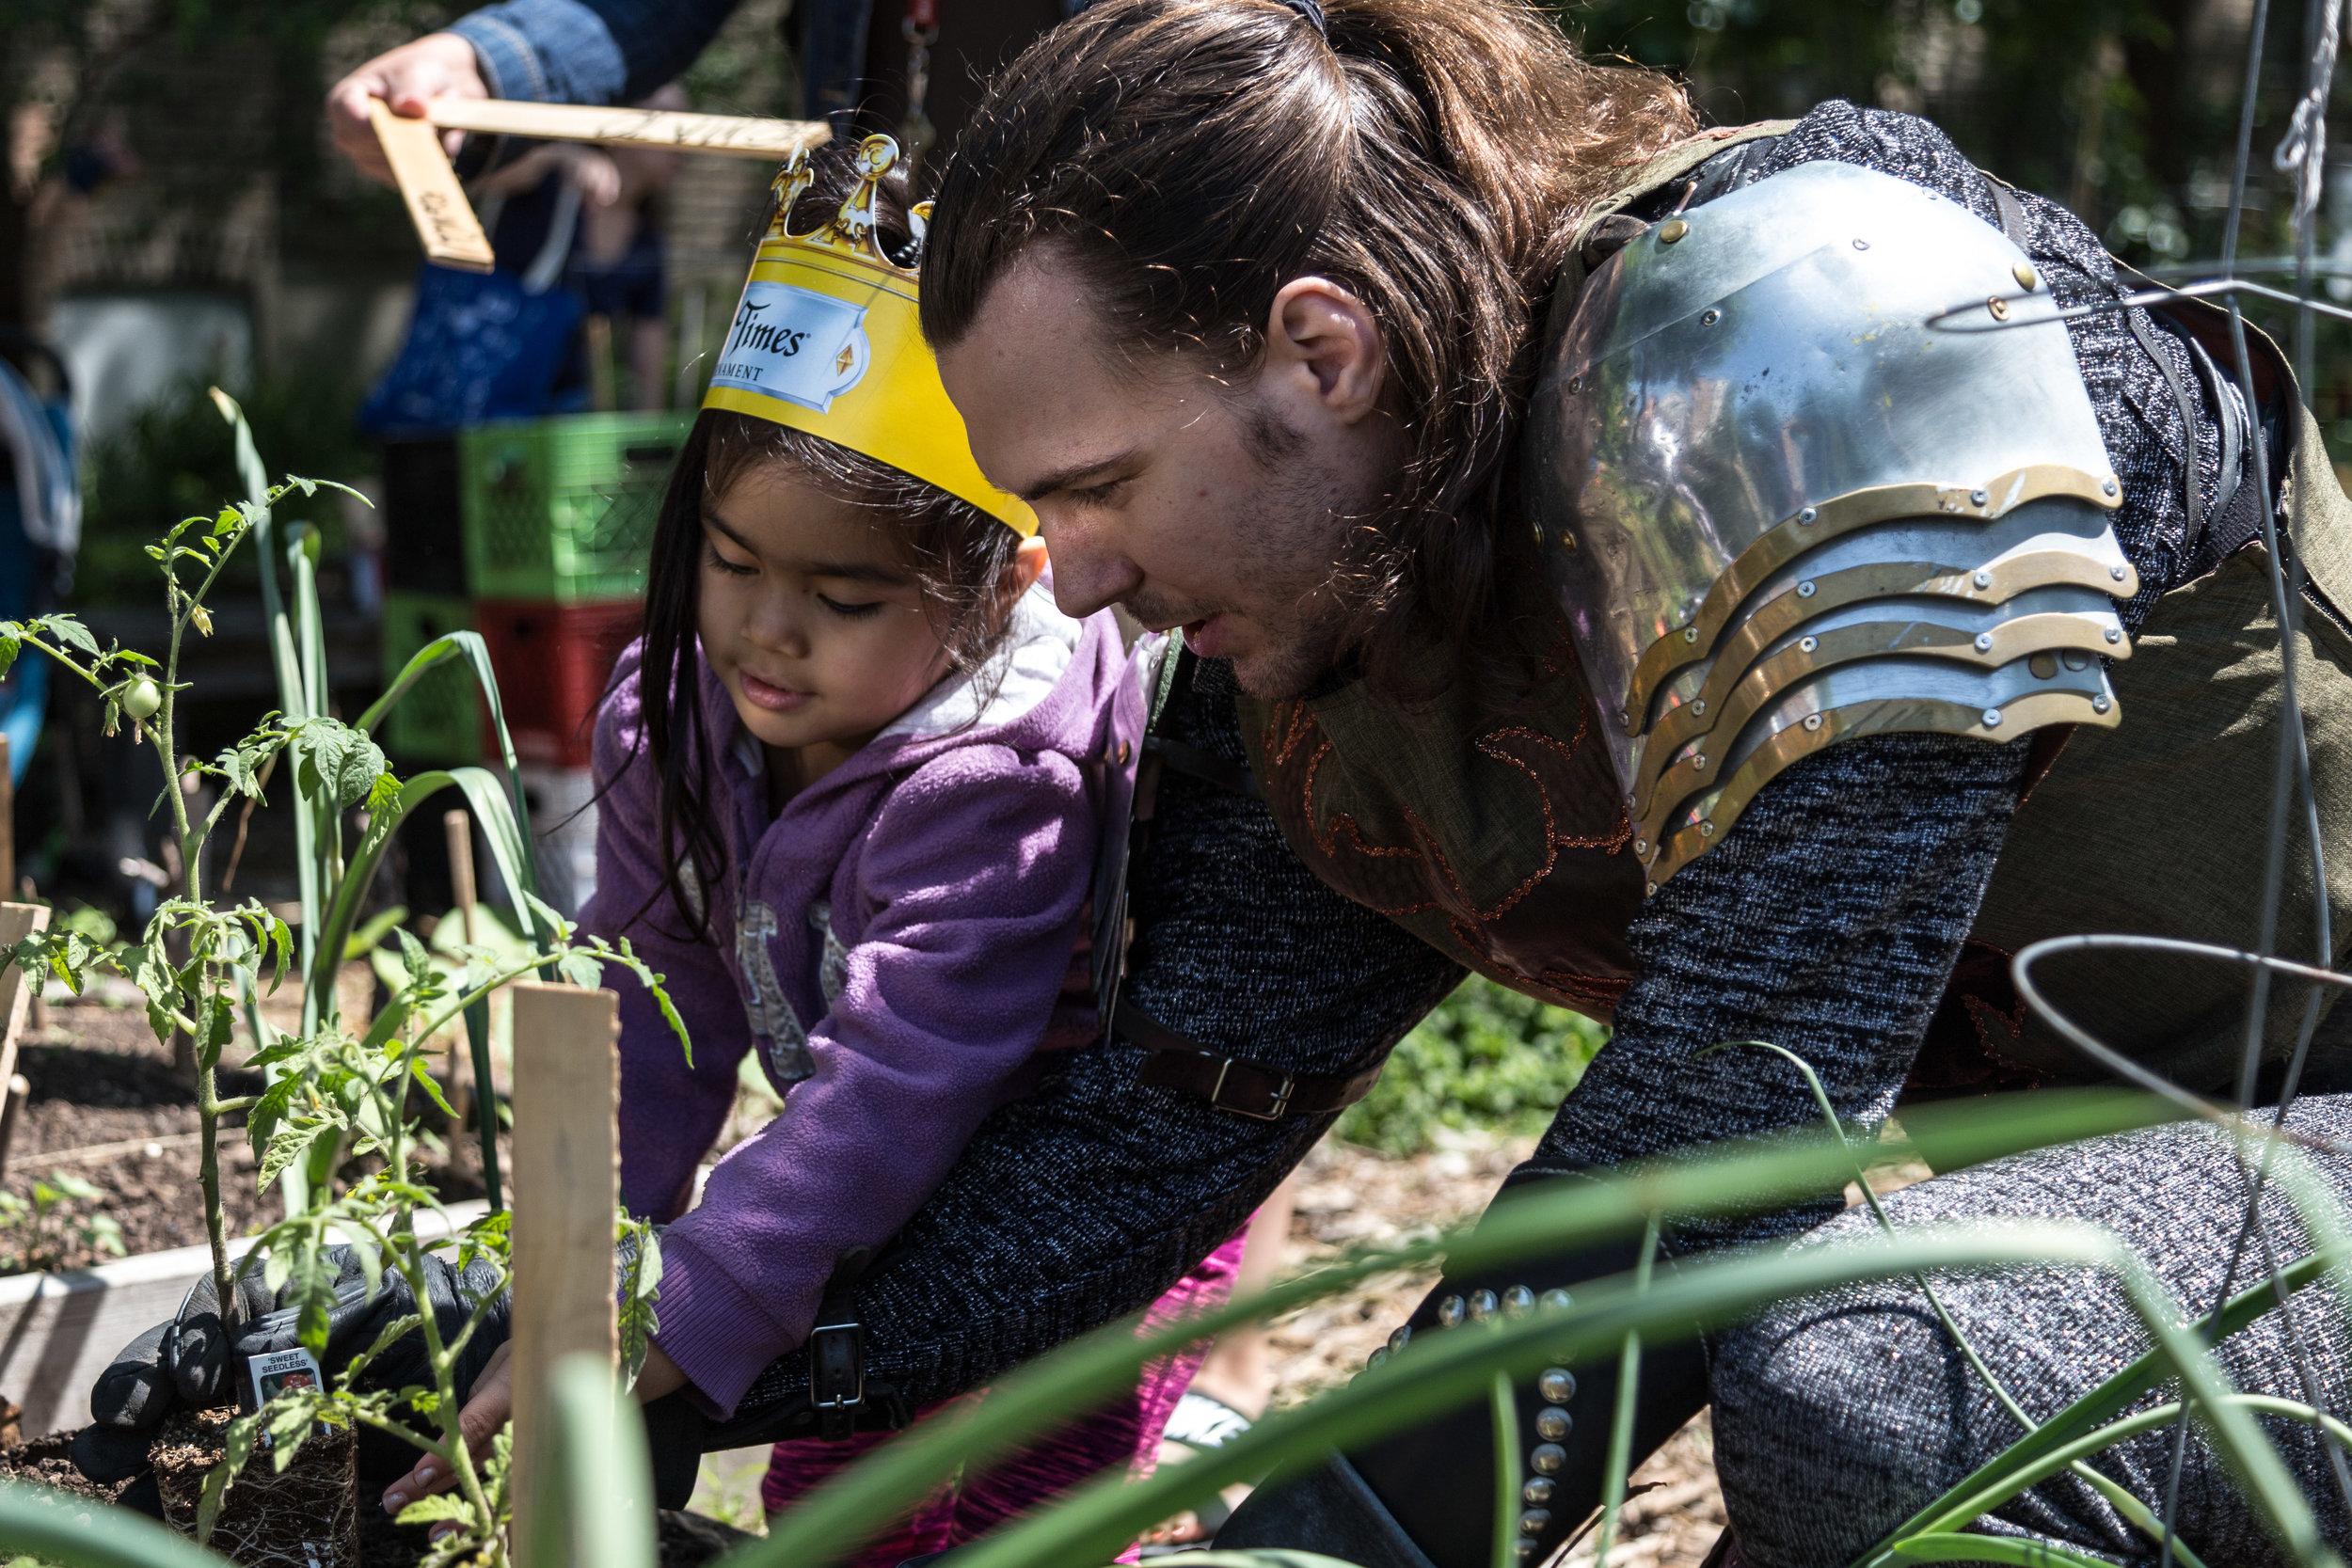 Michael Kiburz, the Green Knight, helps a preschooler plant tomatoes at the Altgeld Sawyer Corner Farm.